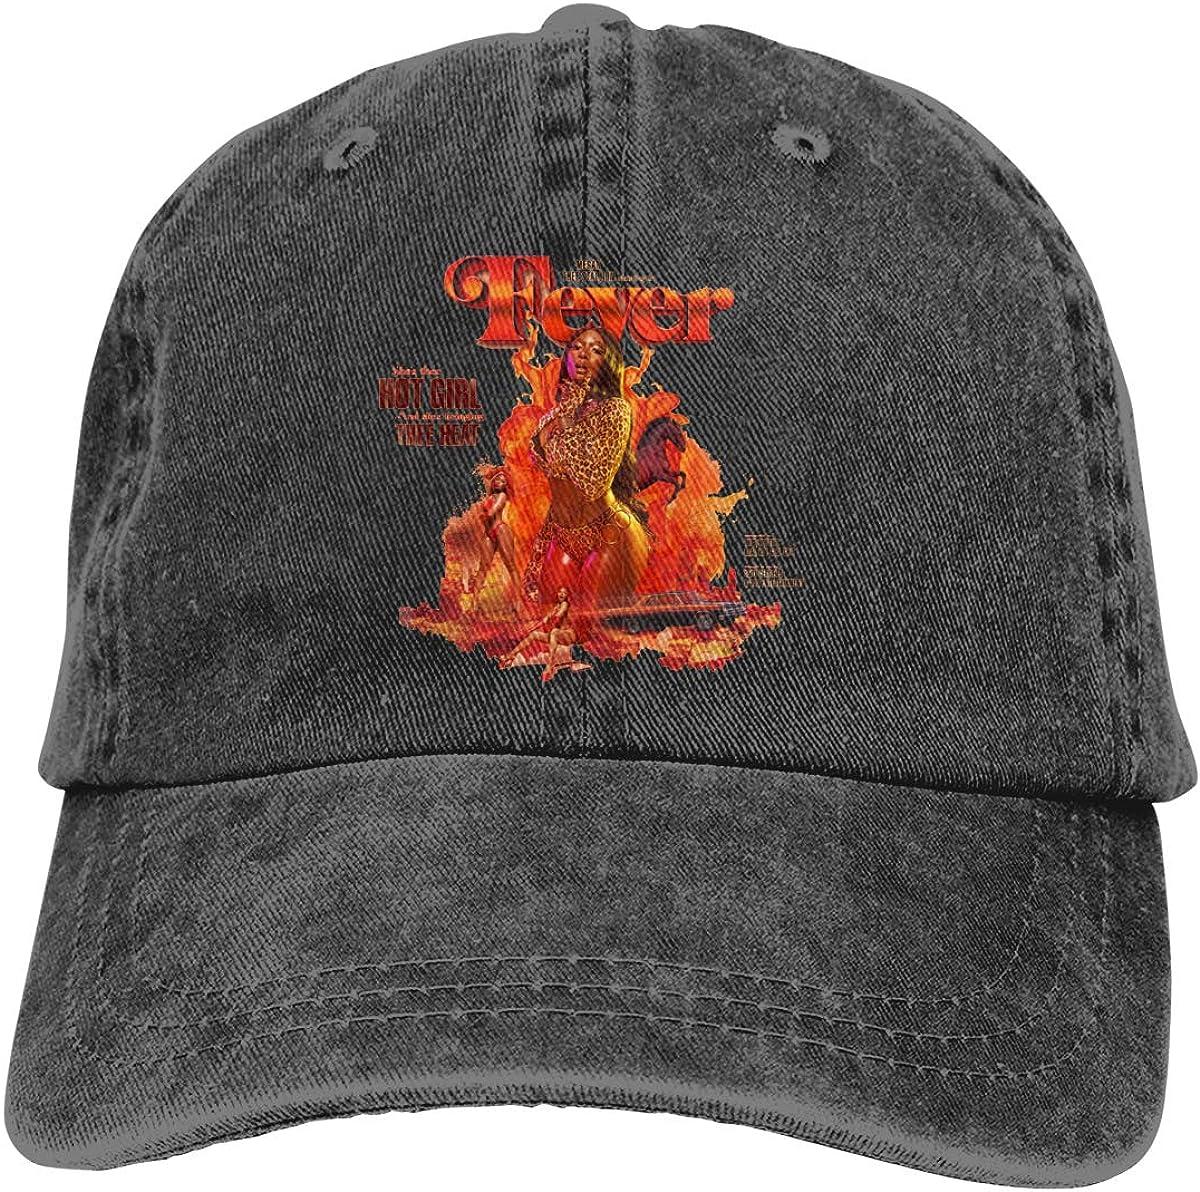 Men and Women 3D Printed Wild Megan Thee Stallion Cowboy Hat Black